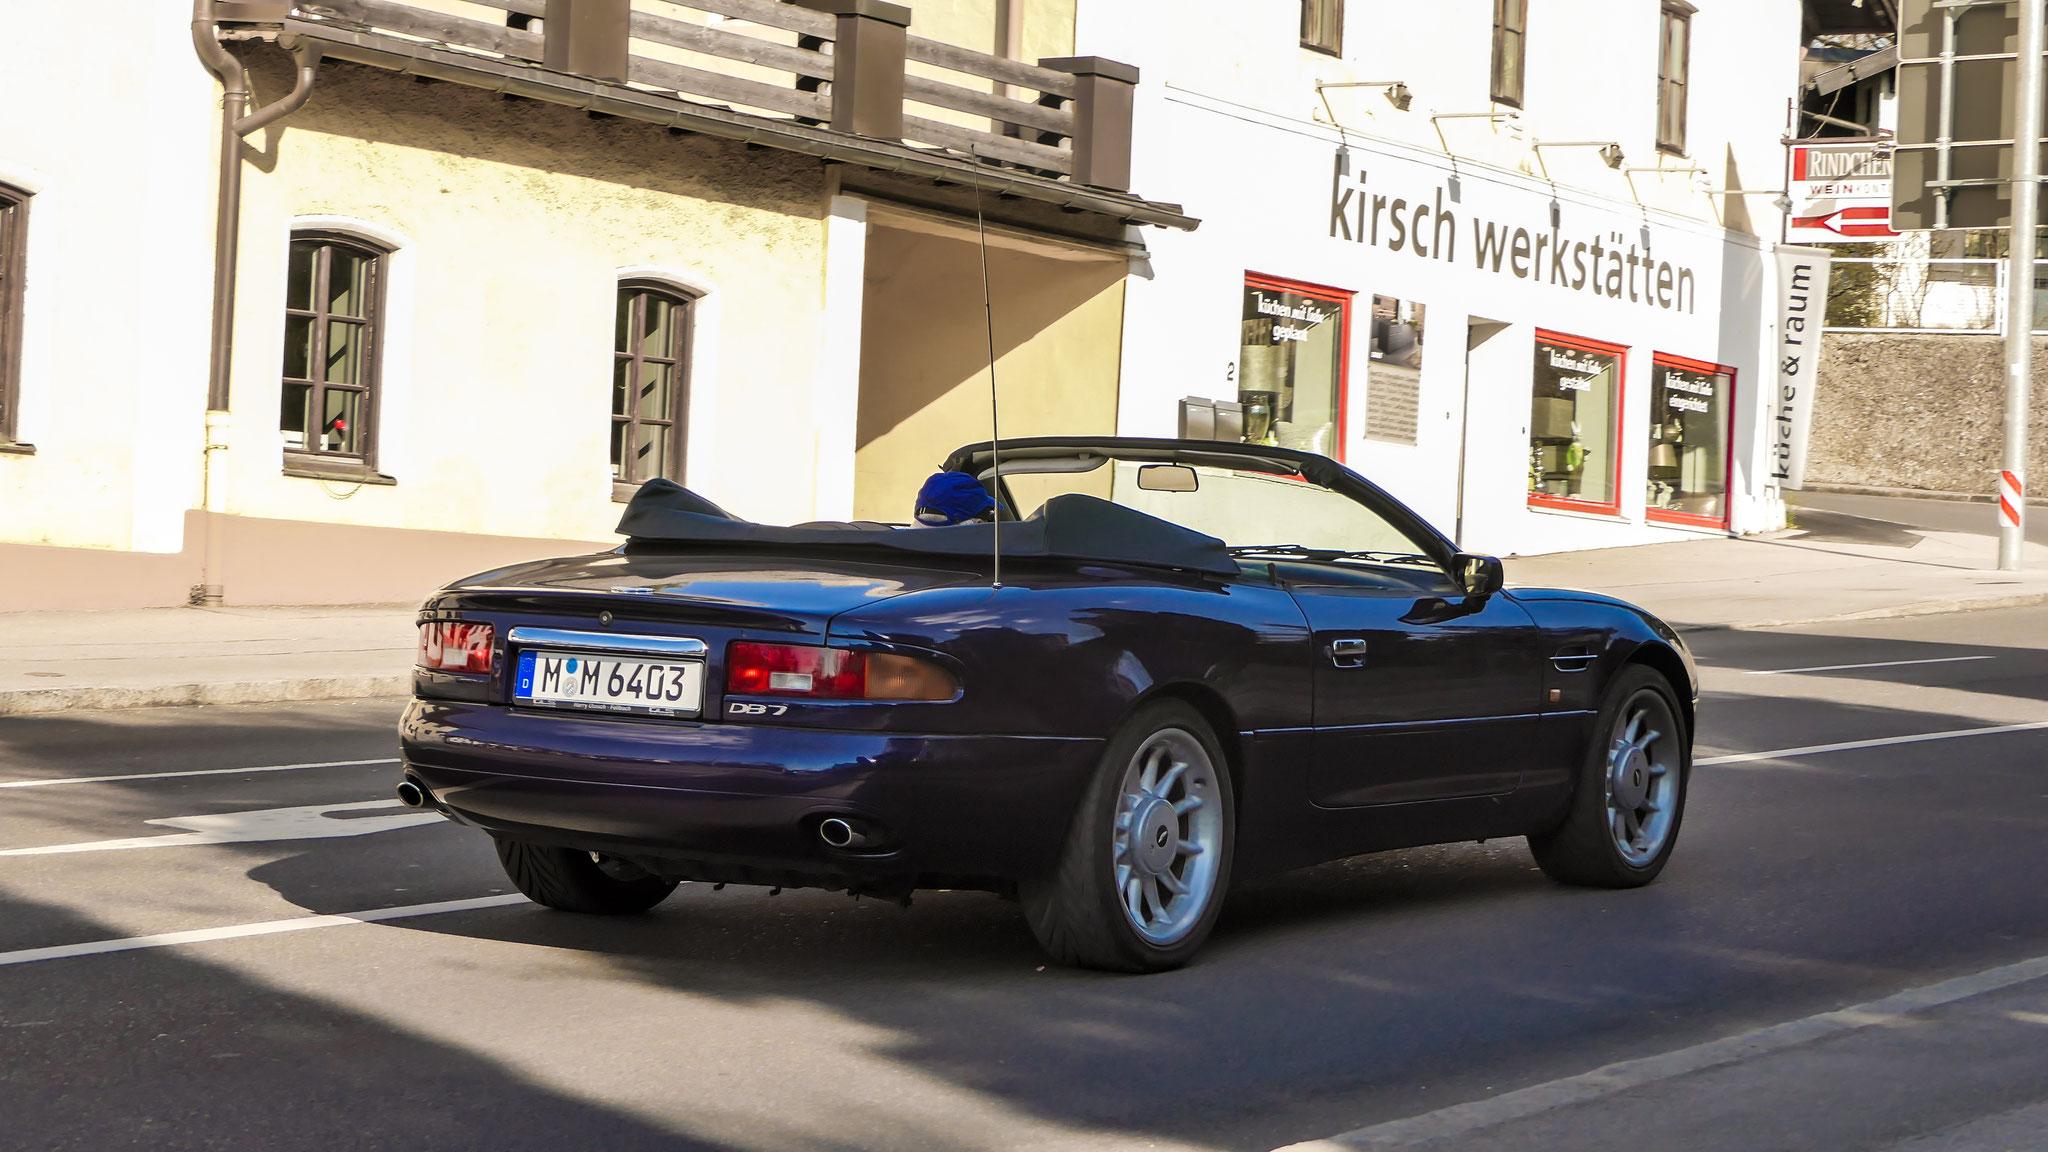 Aston Martin DB7 Volante - M-M-6403